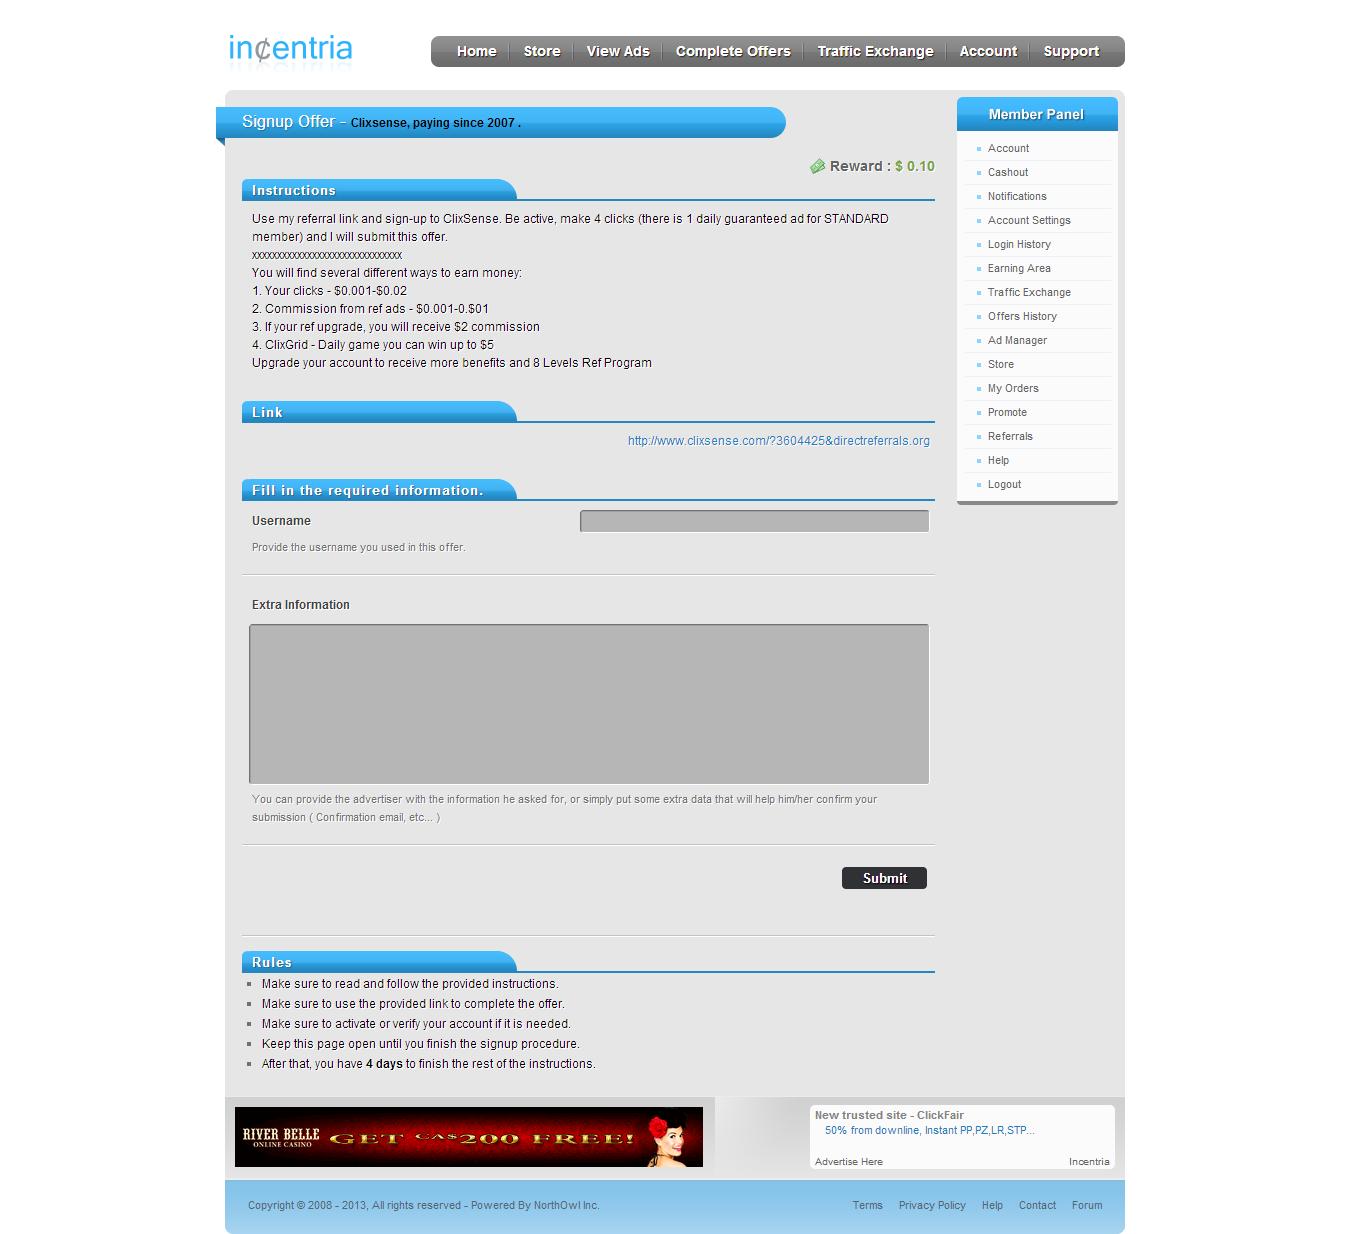 Incentria+++Signup+Offer+++Clixsense++paying+since+2007+. নতুন ফ্রিলেন্সারদের জন্য একটি পোস্ট না দেখলে মিস !